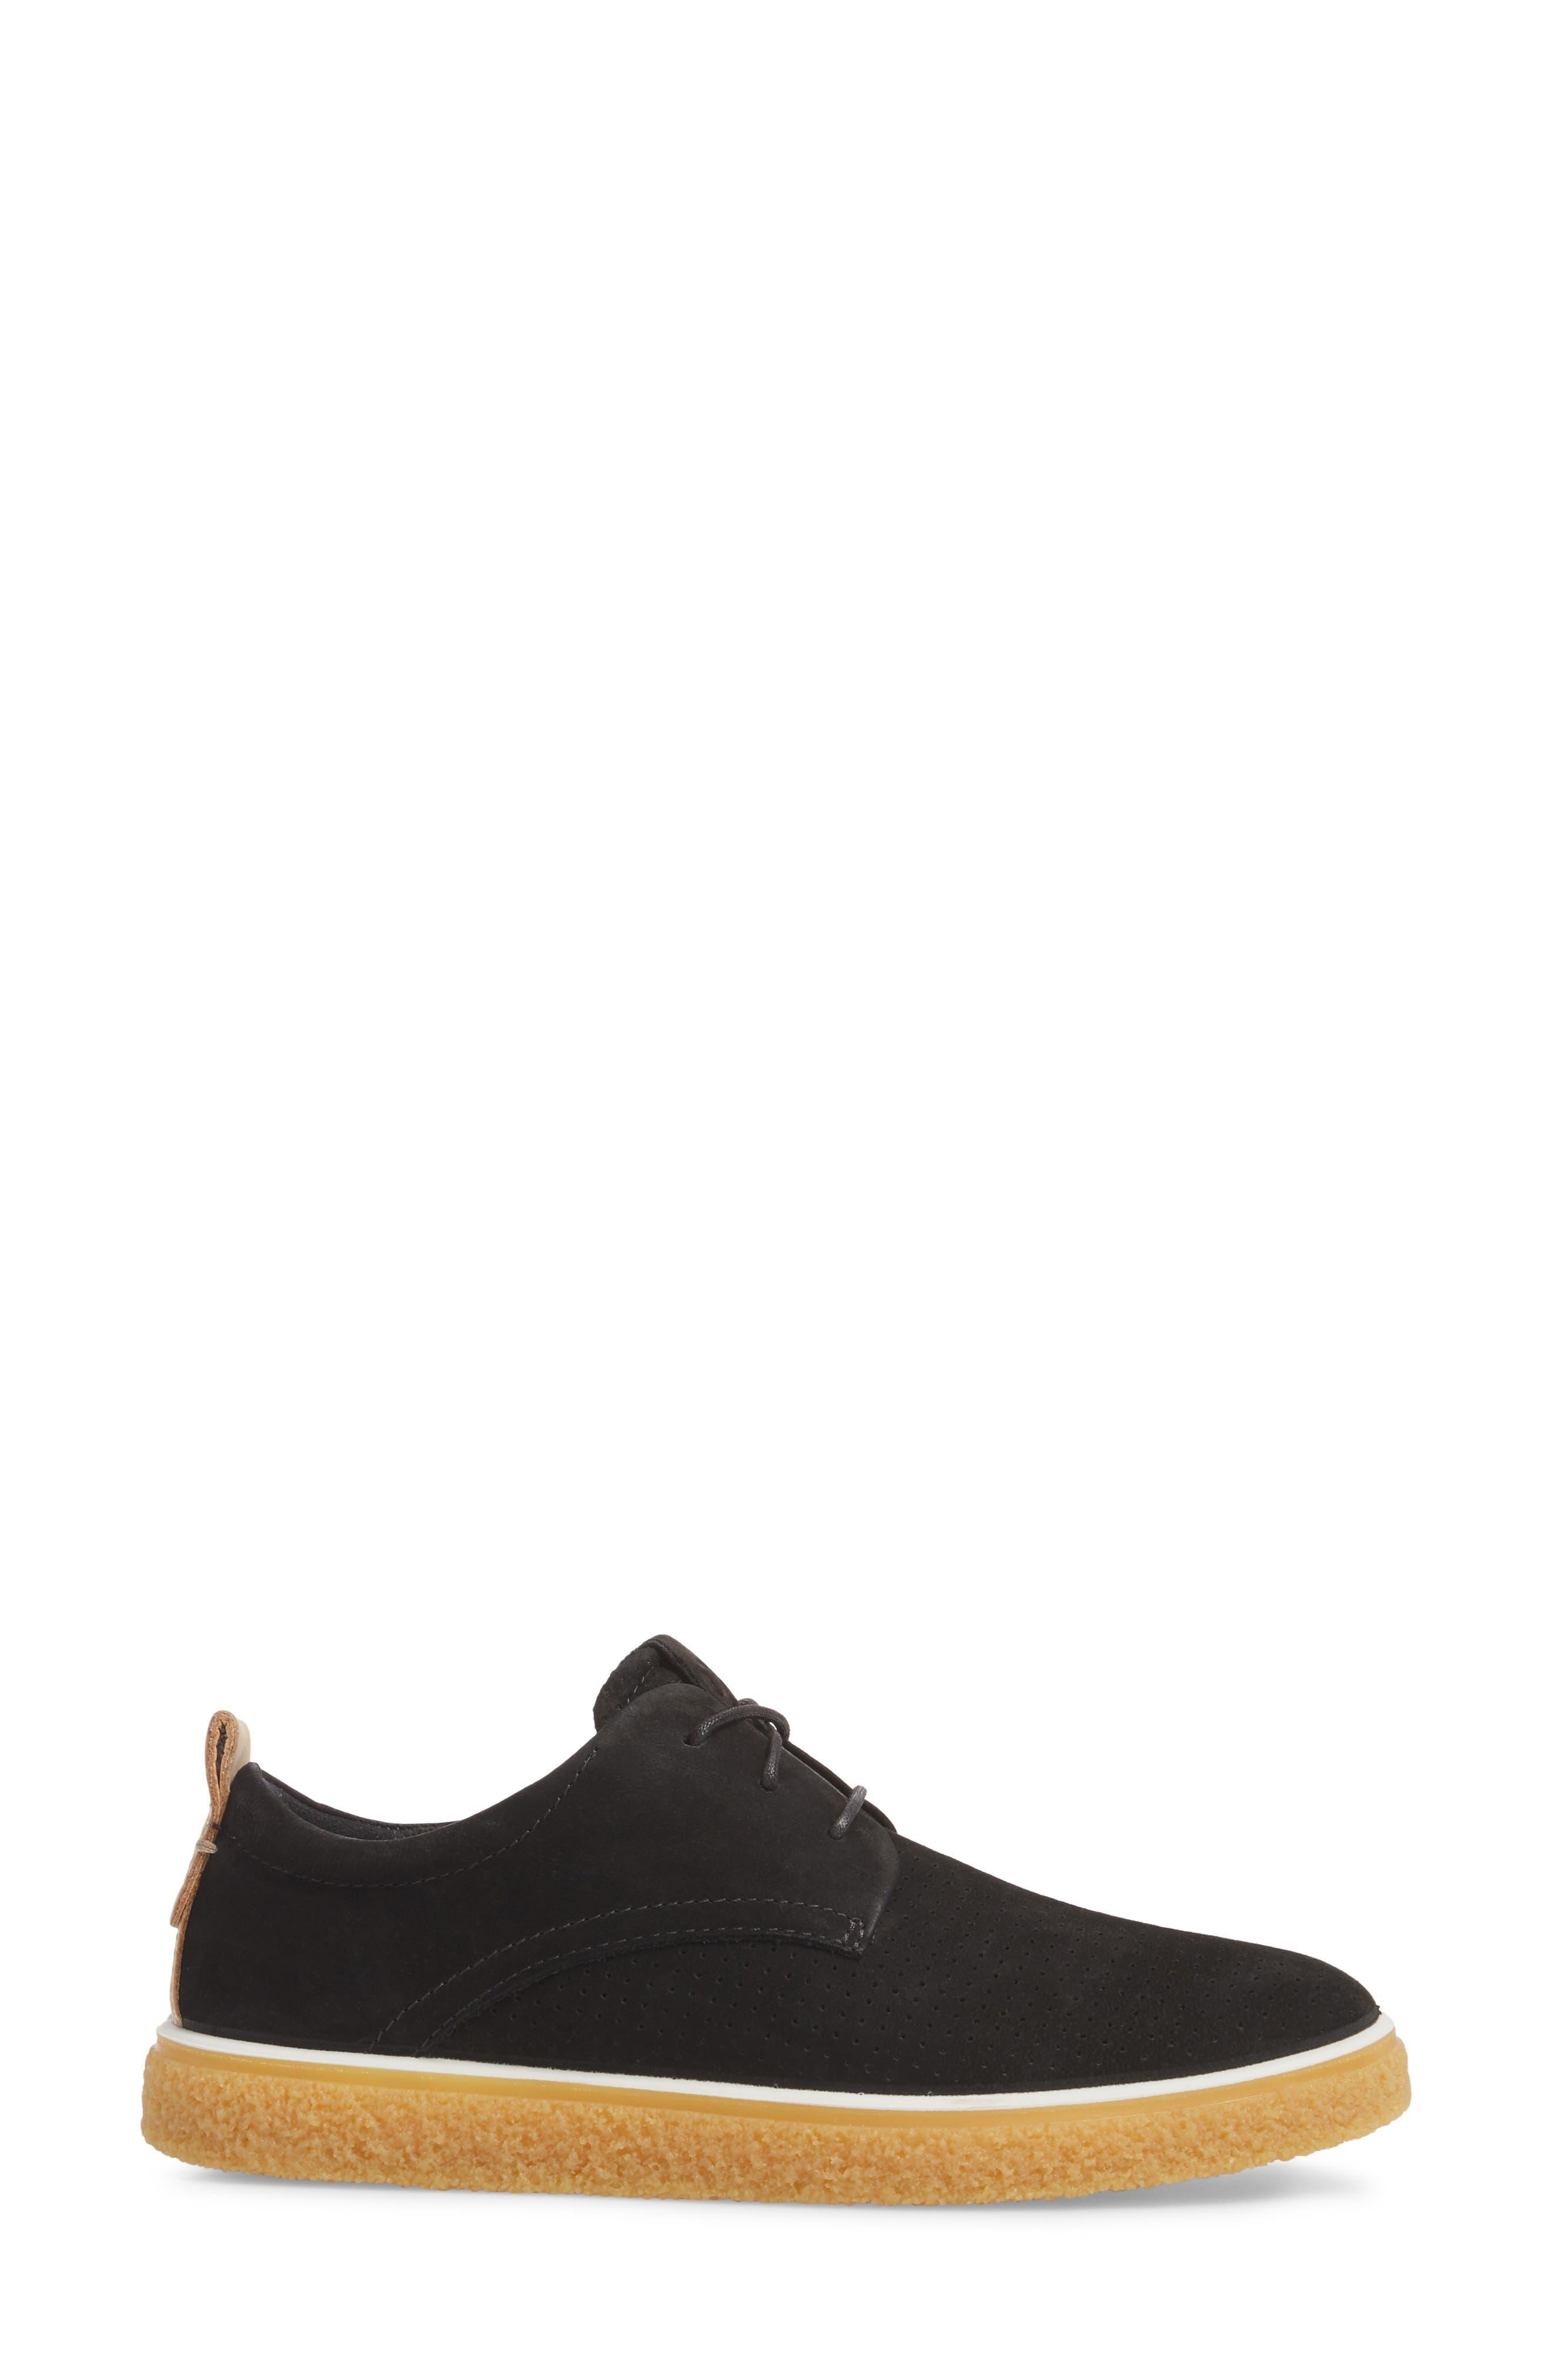 Crepetray Sneaker,                             Alternate thumbnail 3, color,                             009